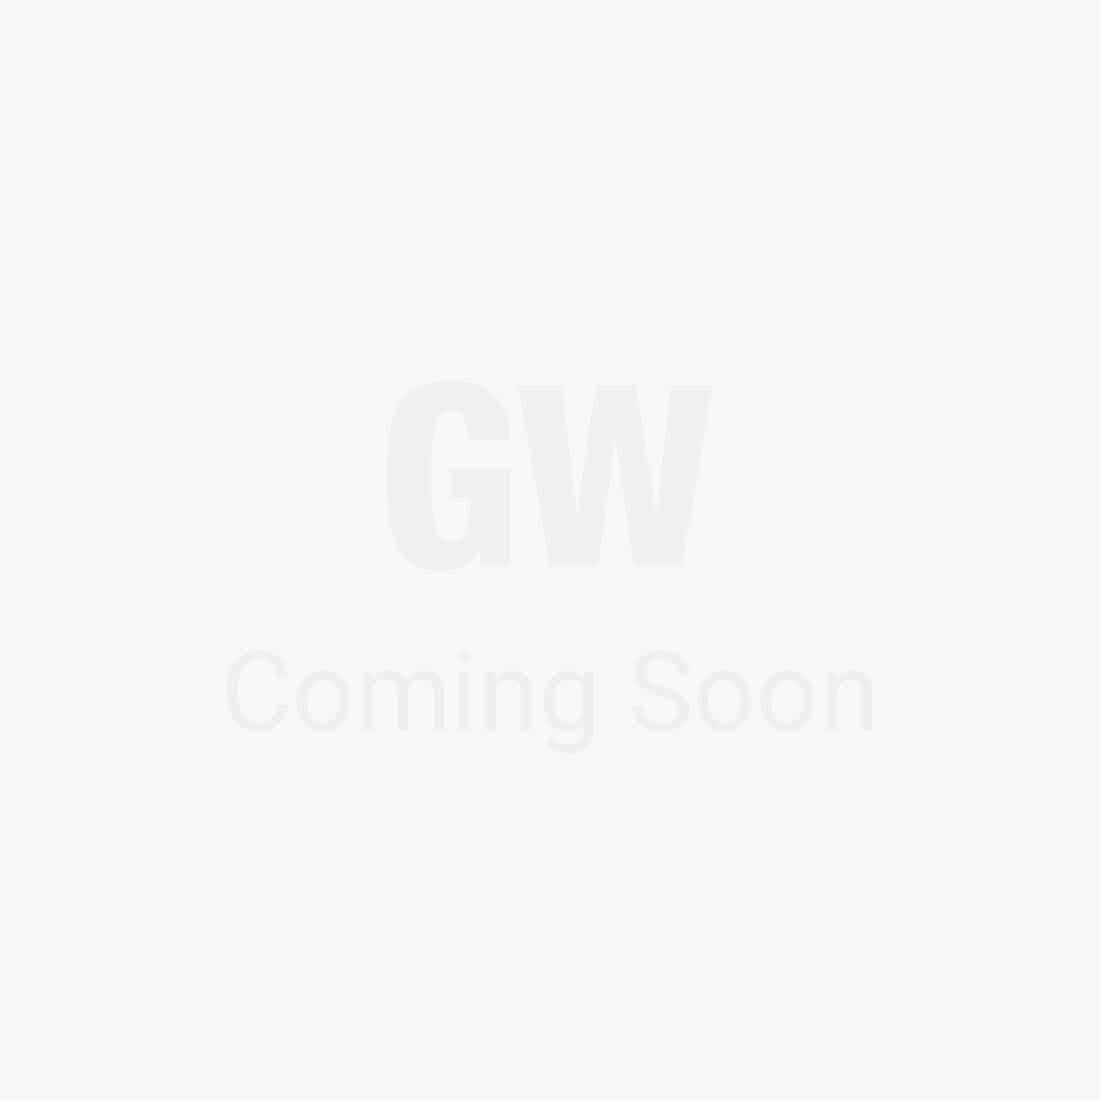 Ossa Rib Coffee Table